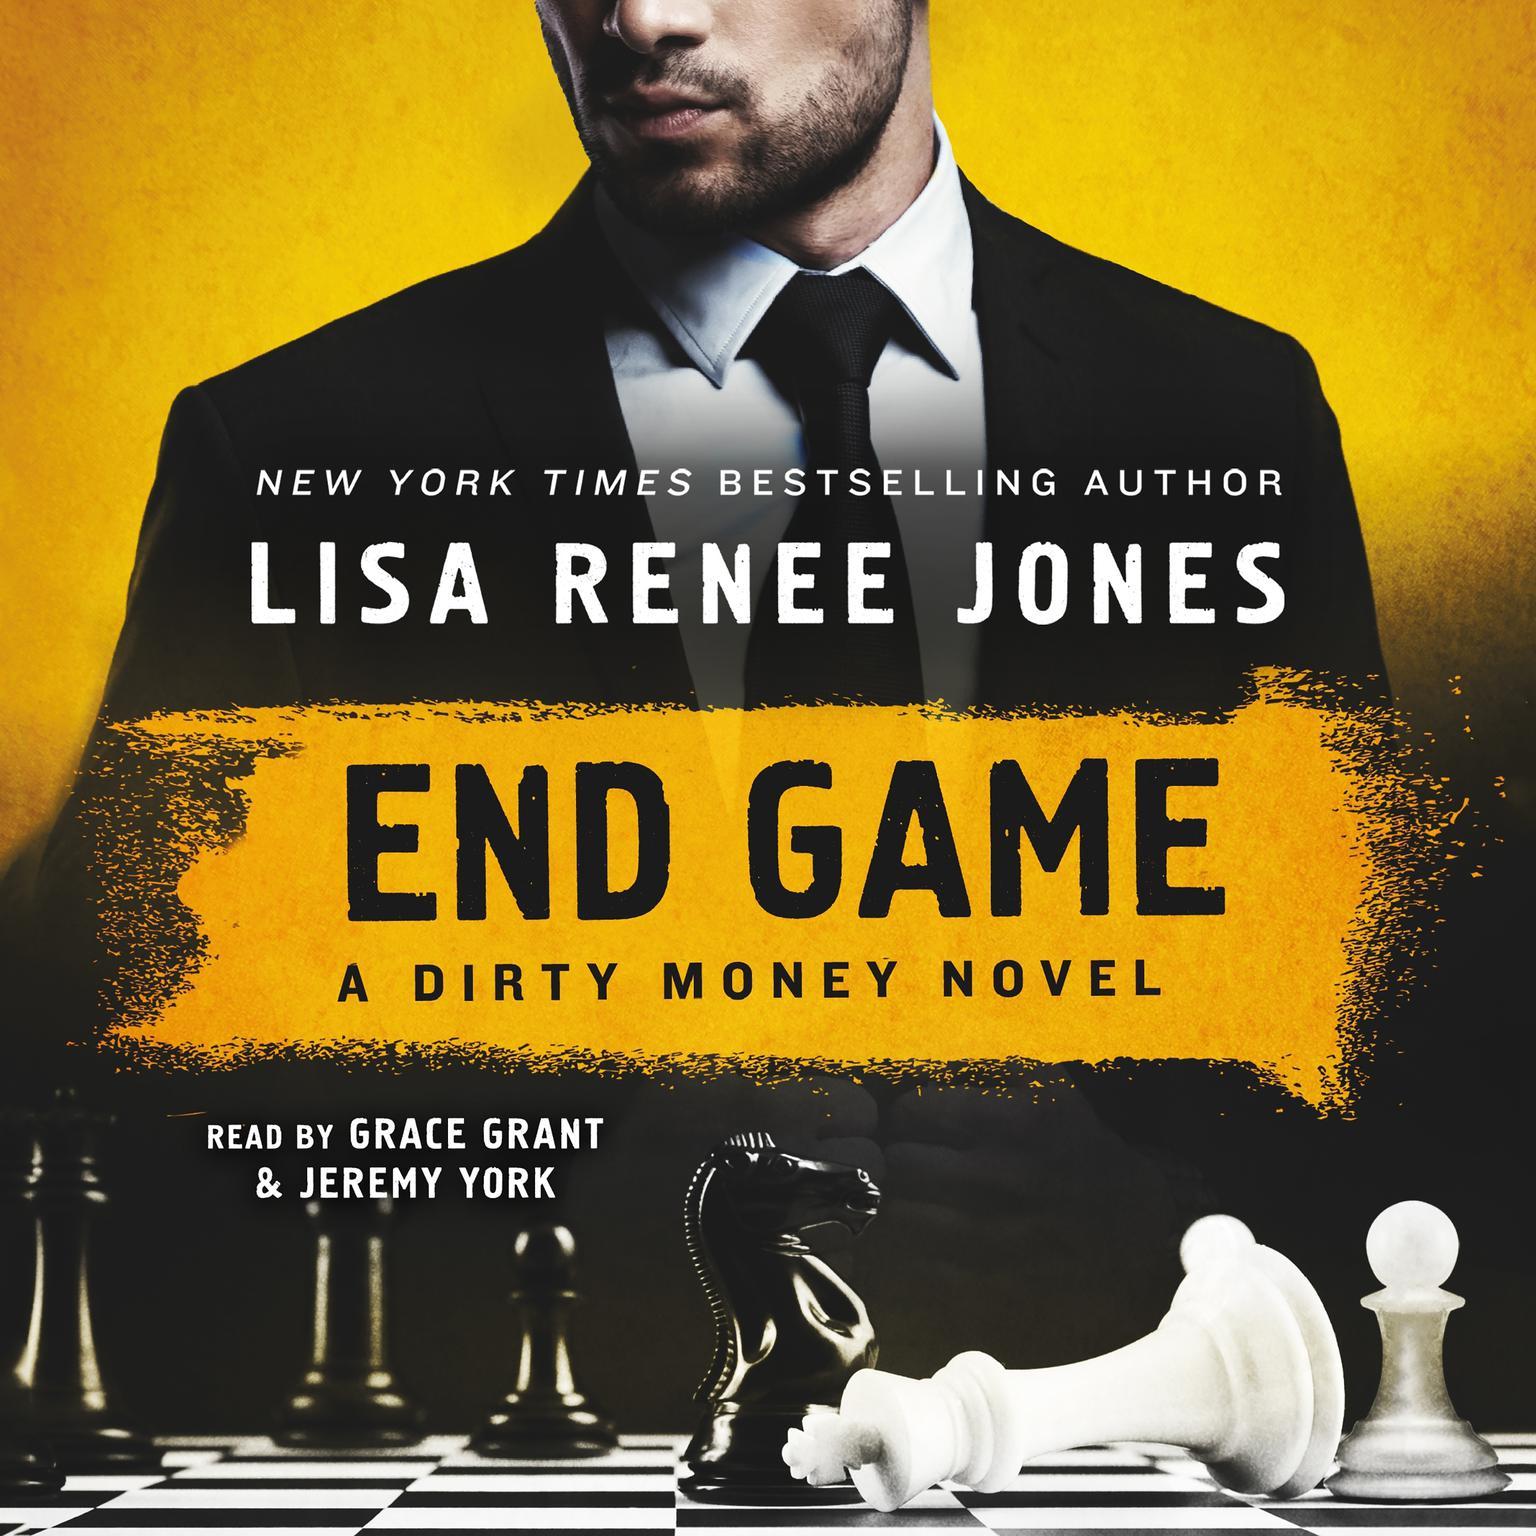 End Game: A Dirty Money Novel Audiobook, by Lisa Renee Jones